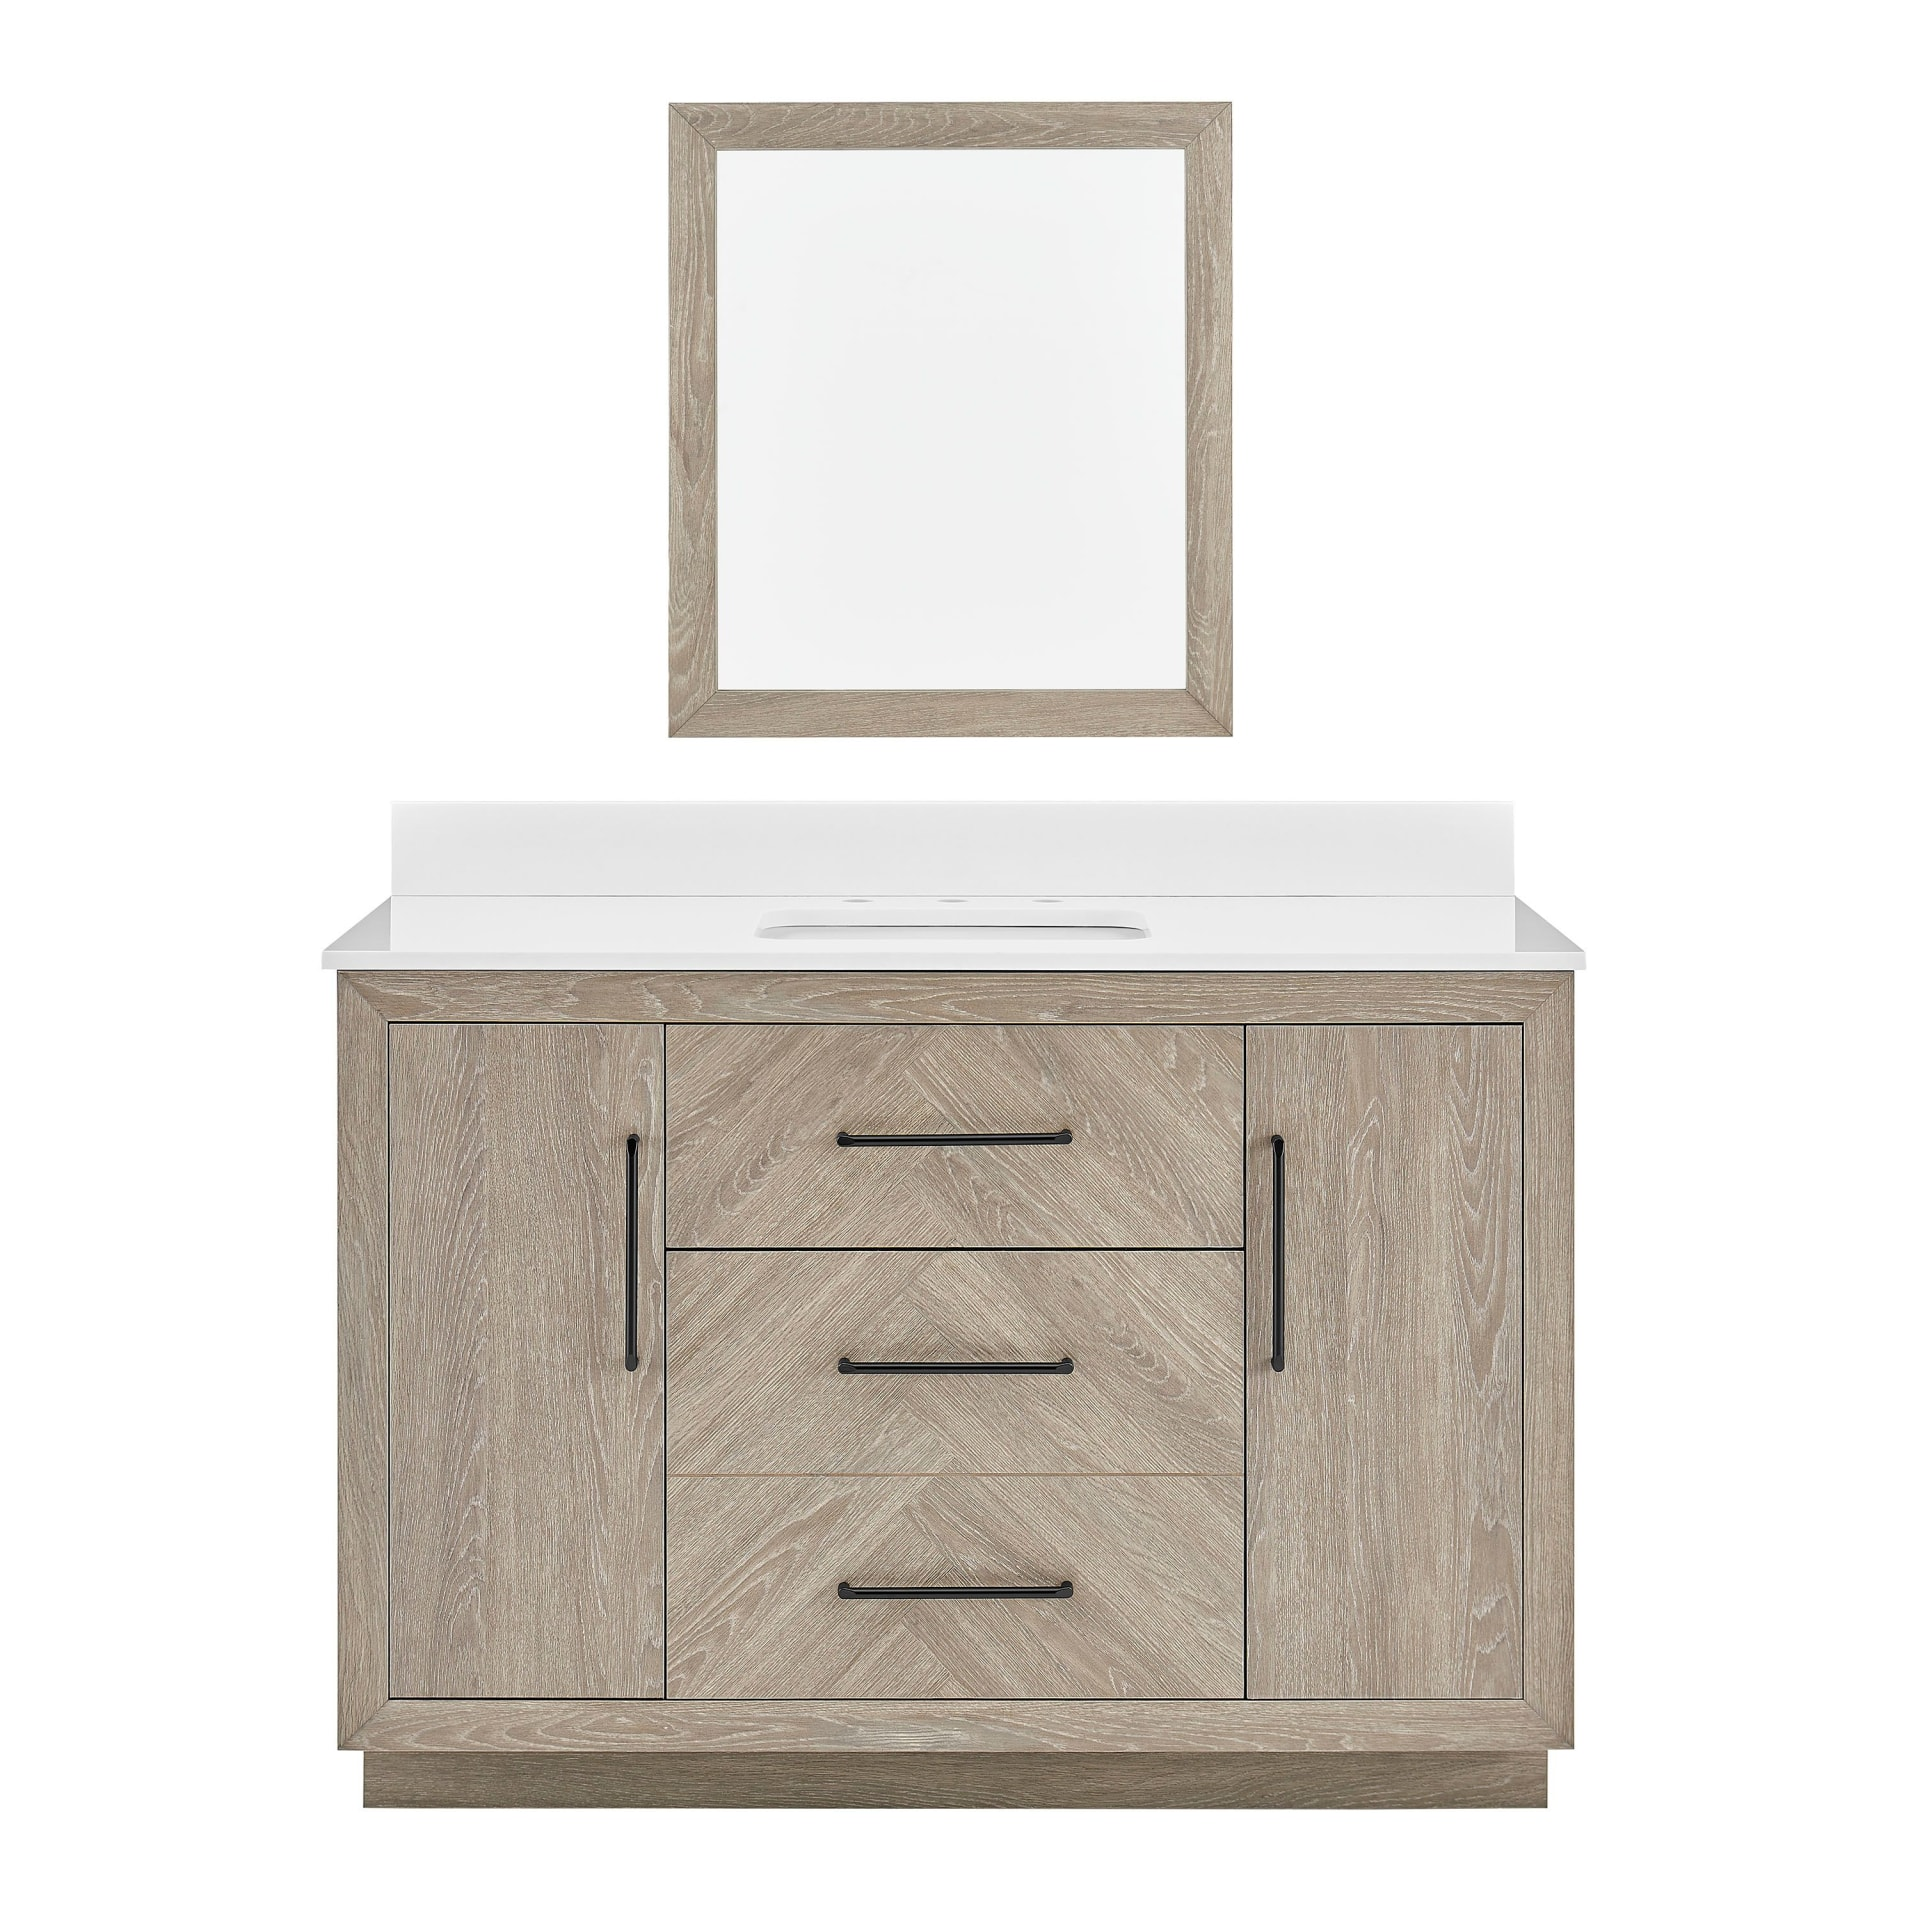 Style Selections 48 In Weathered Oak, Weathered Oak Bathroom Vanity Mirror